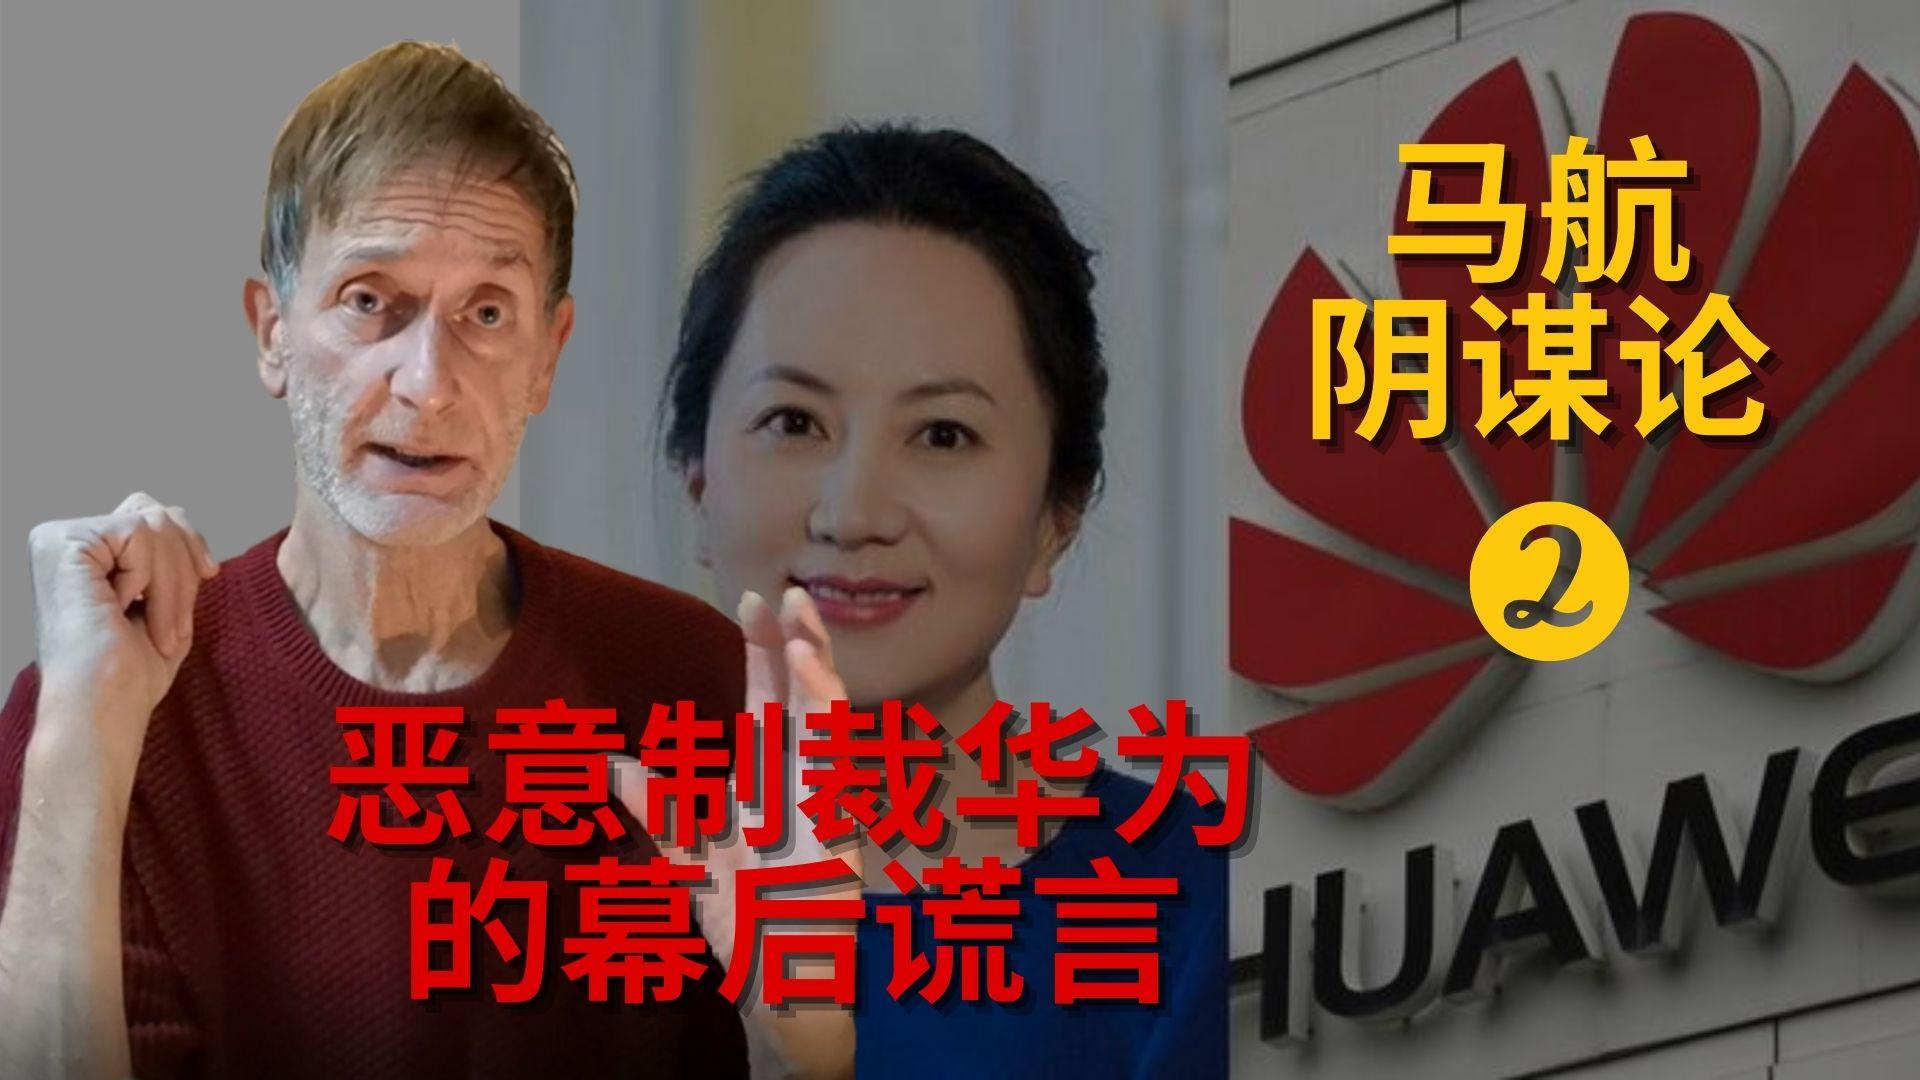 MH370 & Huawei truth